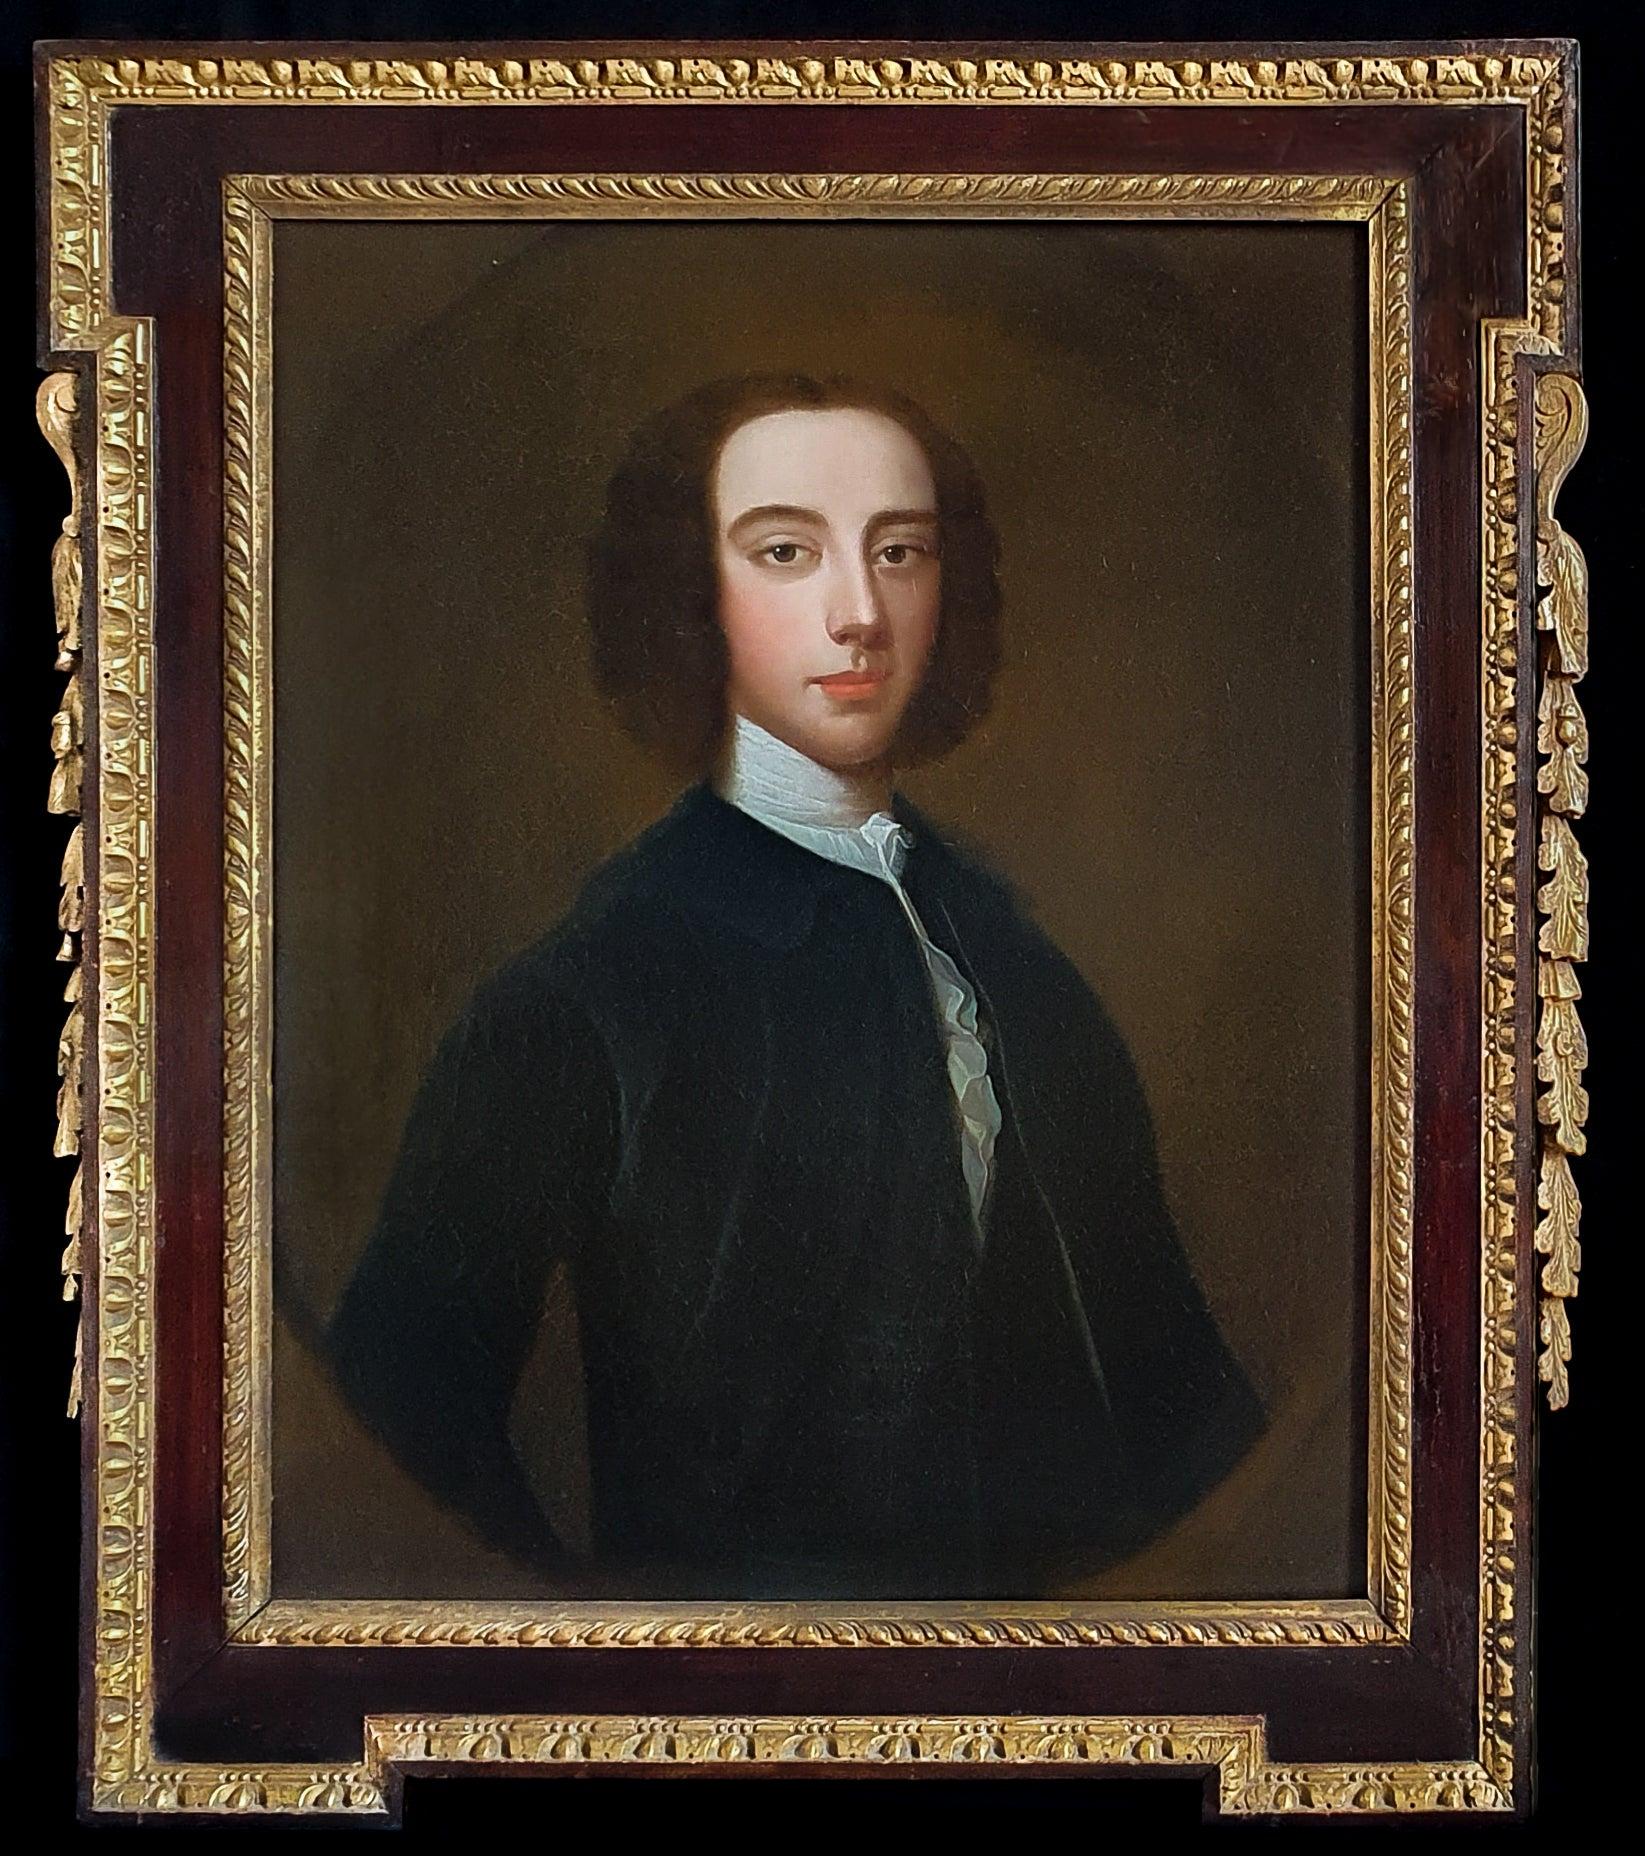 Portrait of a Gentleman, Fine 18th Century Kent Frame, Antique oil Painting